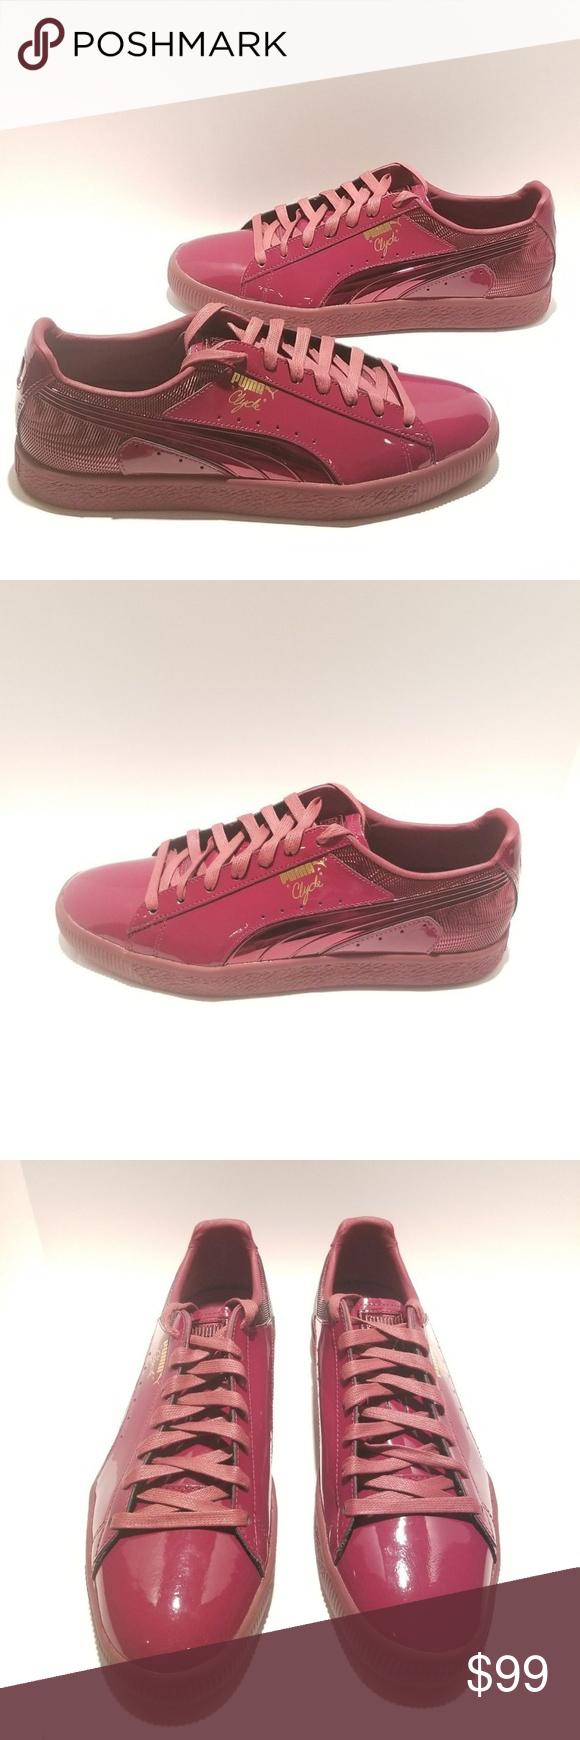 8ea84541ba1 Puma Clyde Wraith Pack Walt Clyde Frazier Shoes Style  Puma Clyde Wraith  Pack Walt Clyde Frazier Cordovan Patent Leather Shoes Color  Burgundy Size   11.5 ...